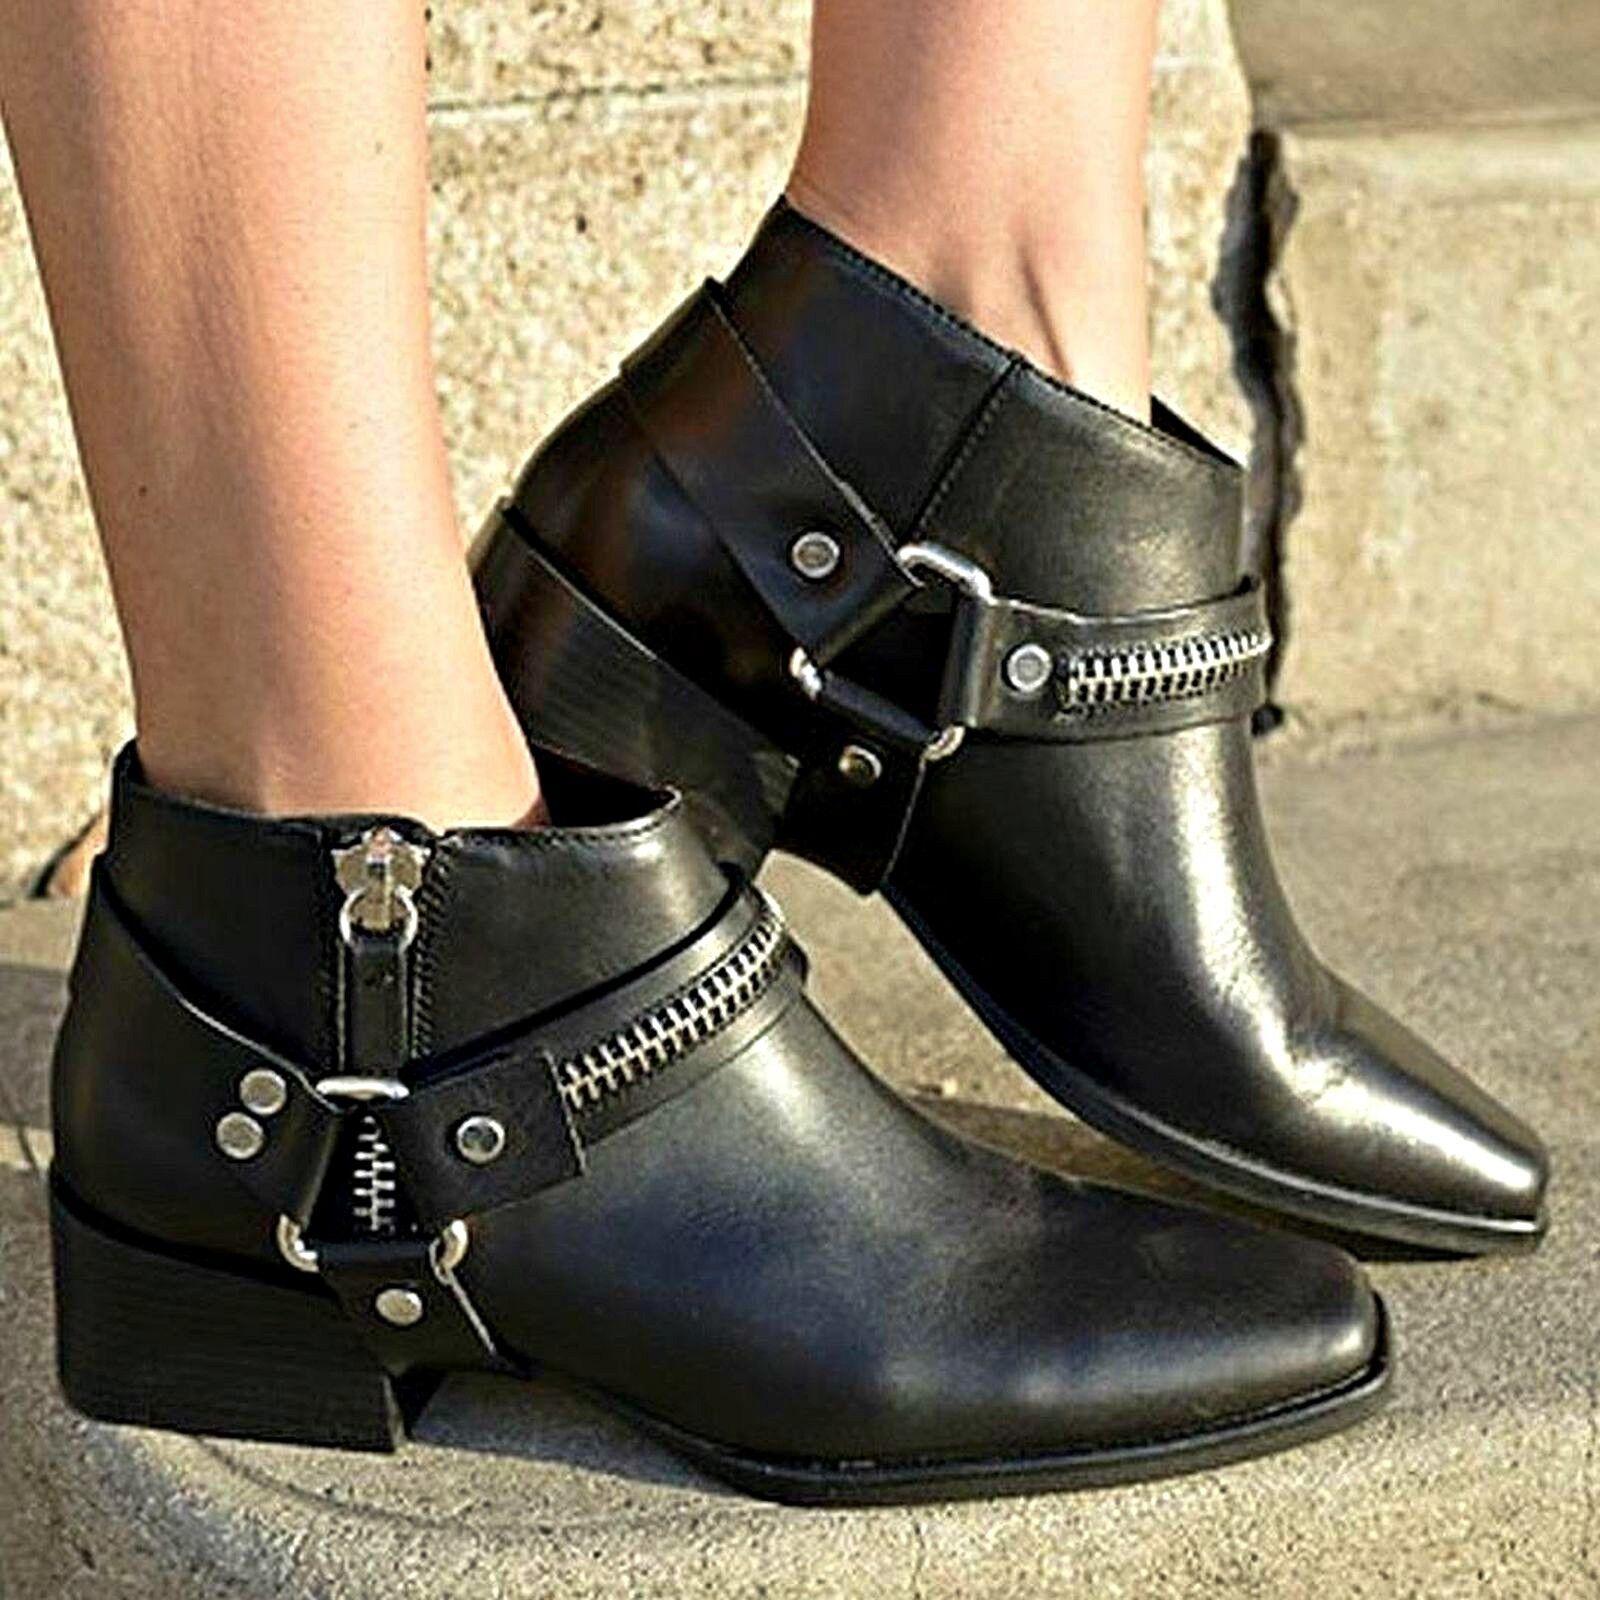 ZARA Black Calfskin Boots Zip & Buckle Woman BNWT Authentic 5102 301